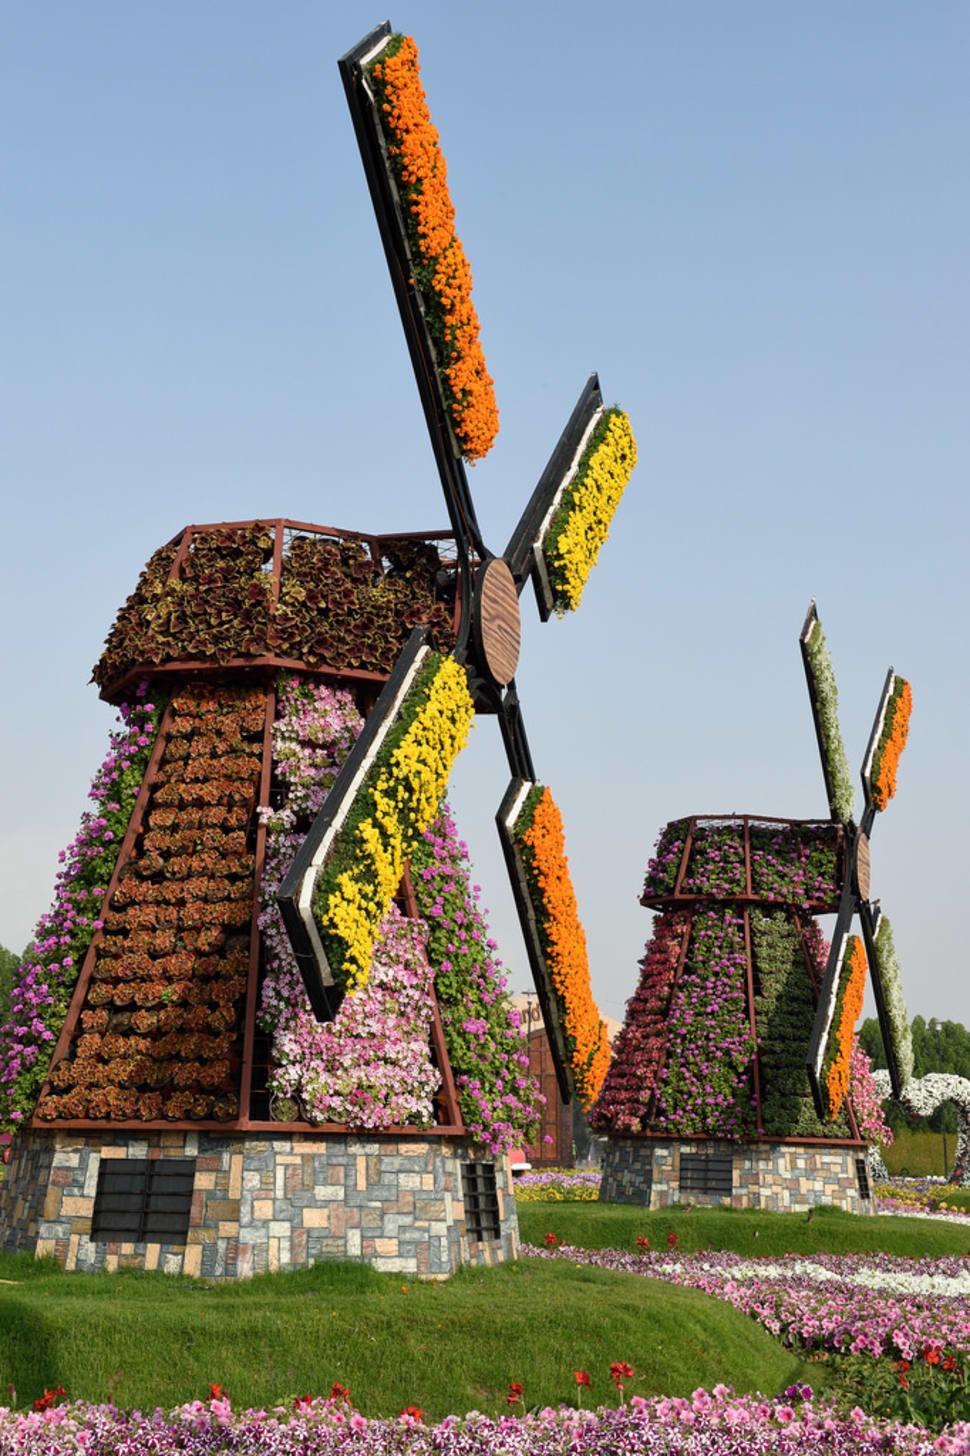 Best time for Dubai Miracle Garden in Dubai